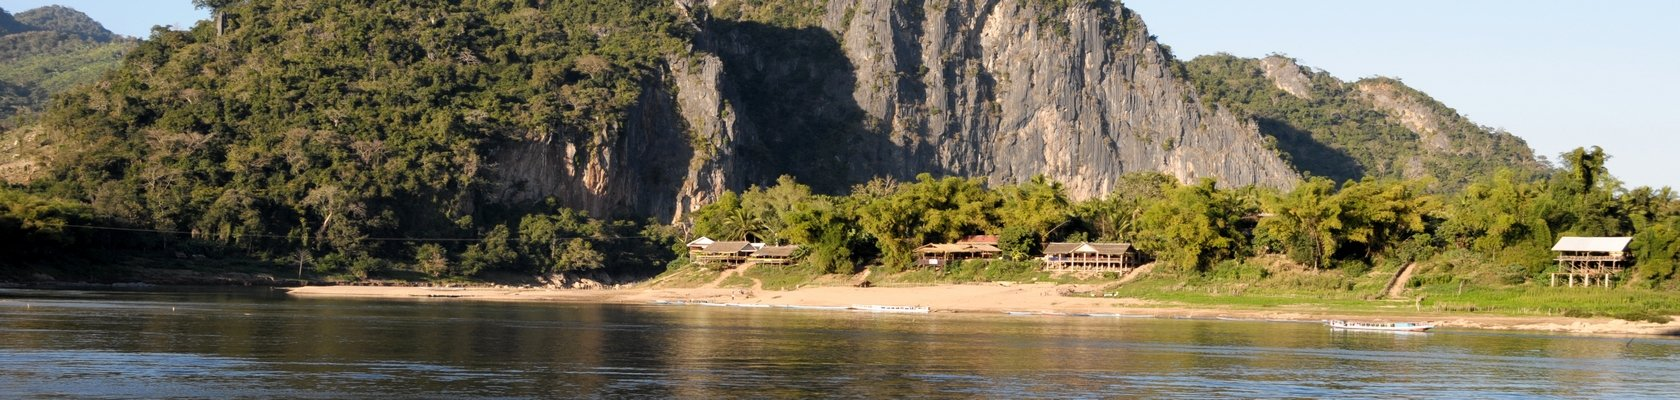 2-daagse boottocht over de Mekong Rivier